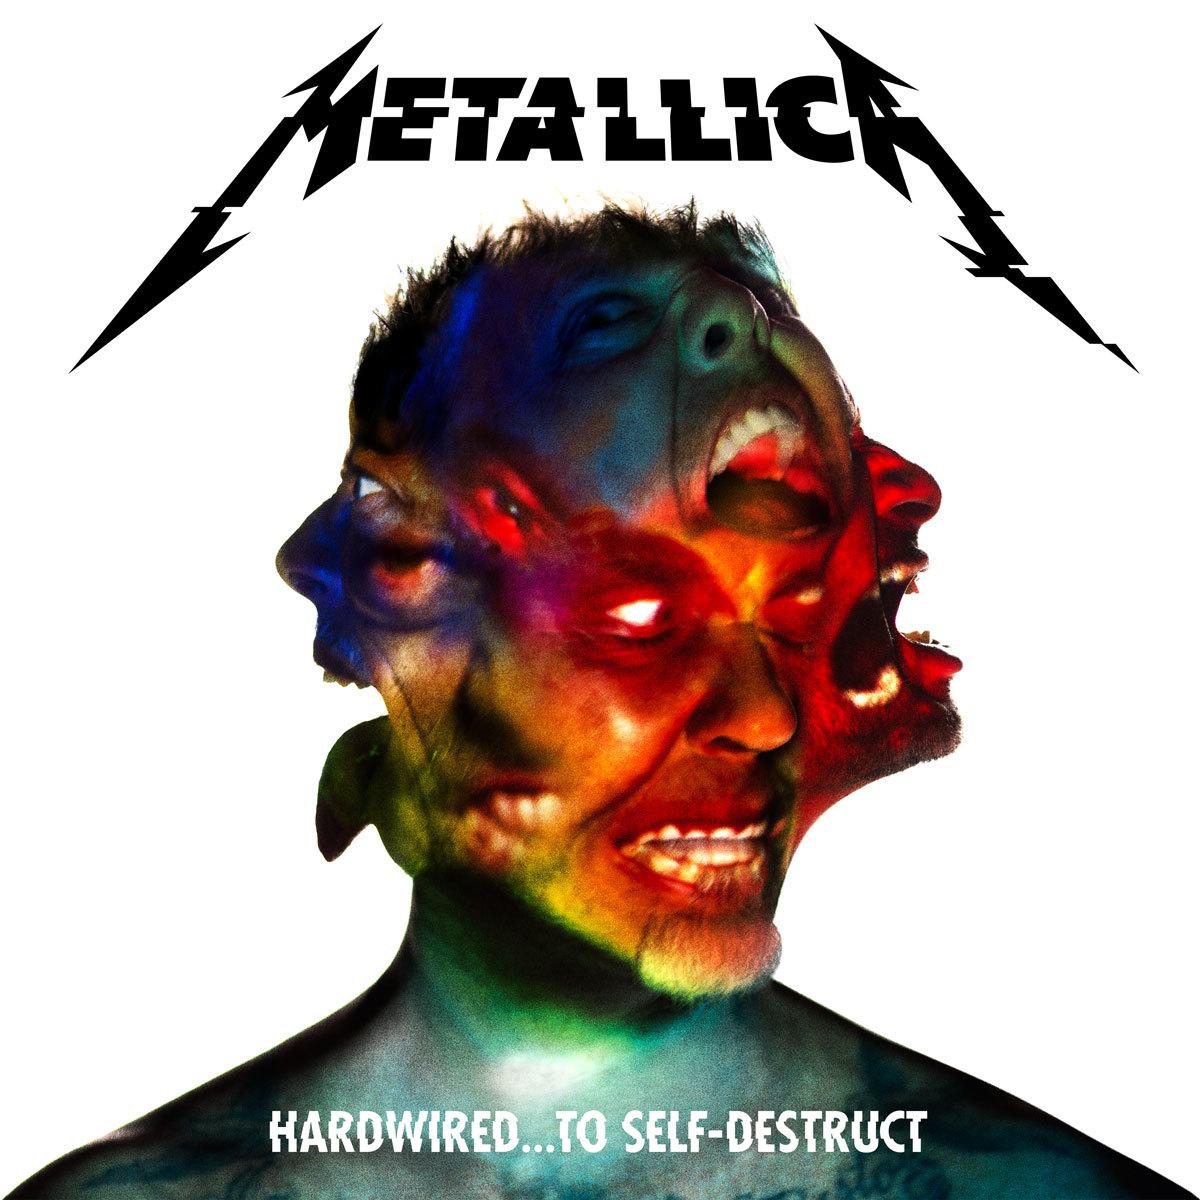 hardwired_metallica